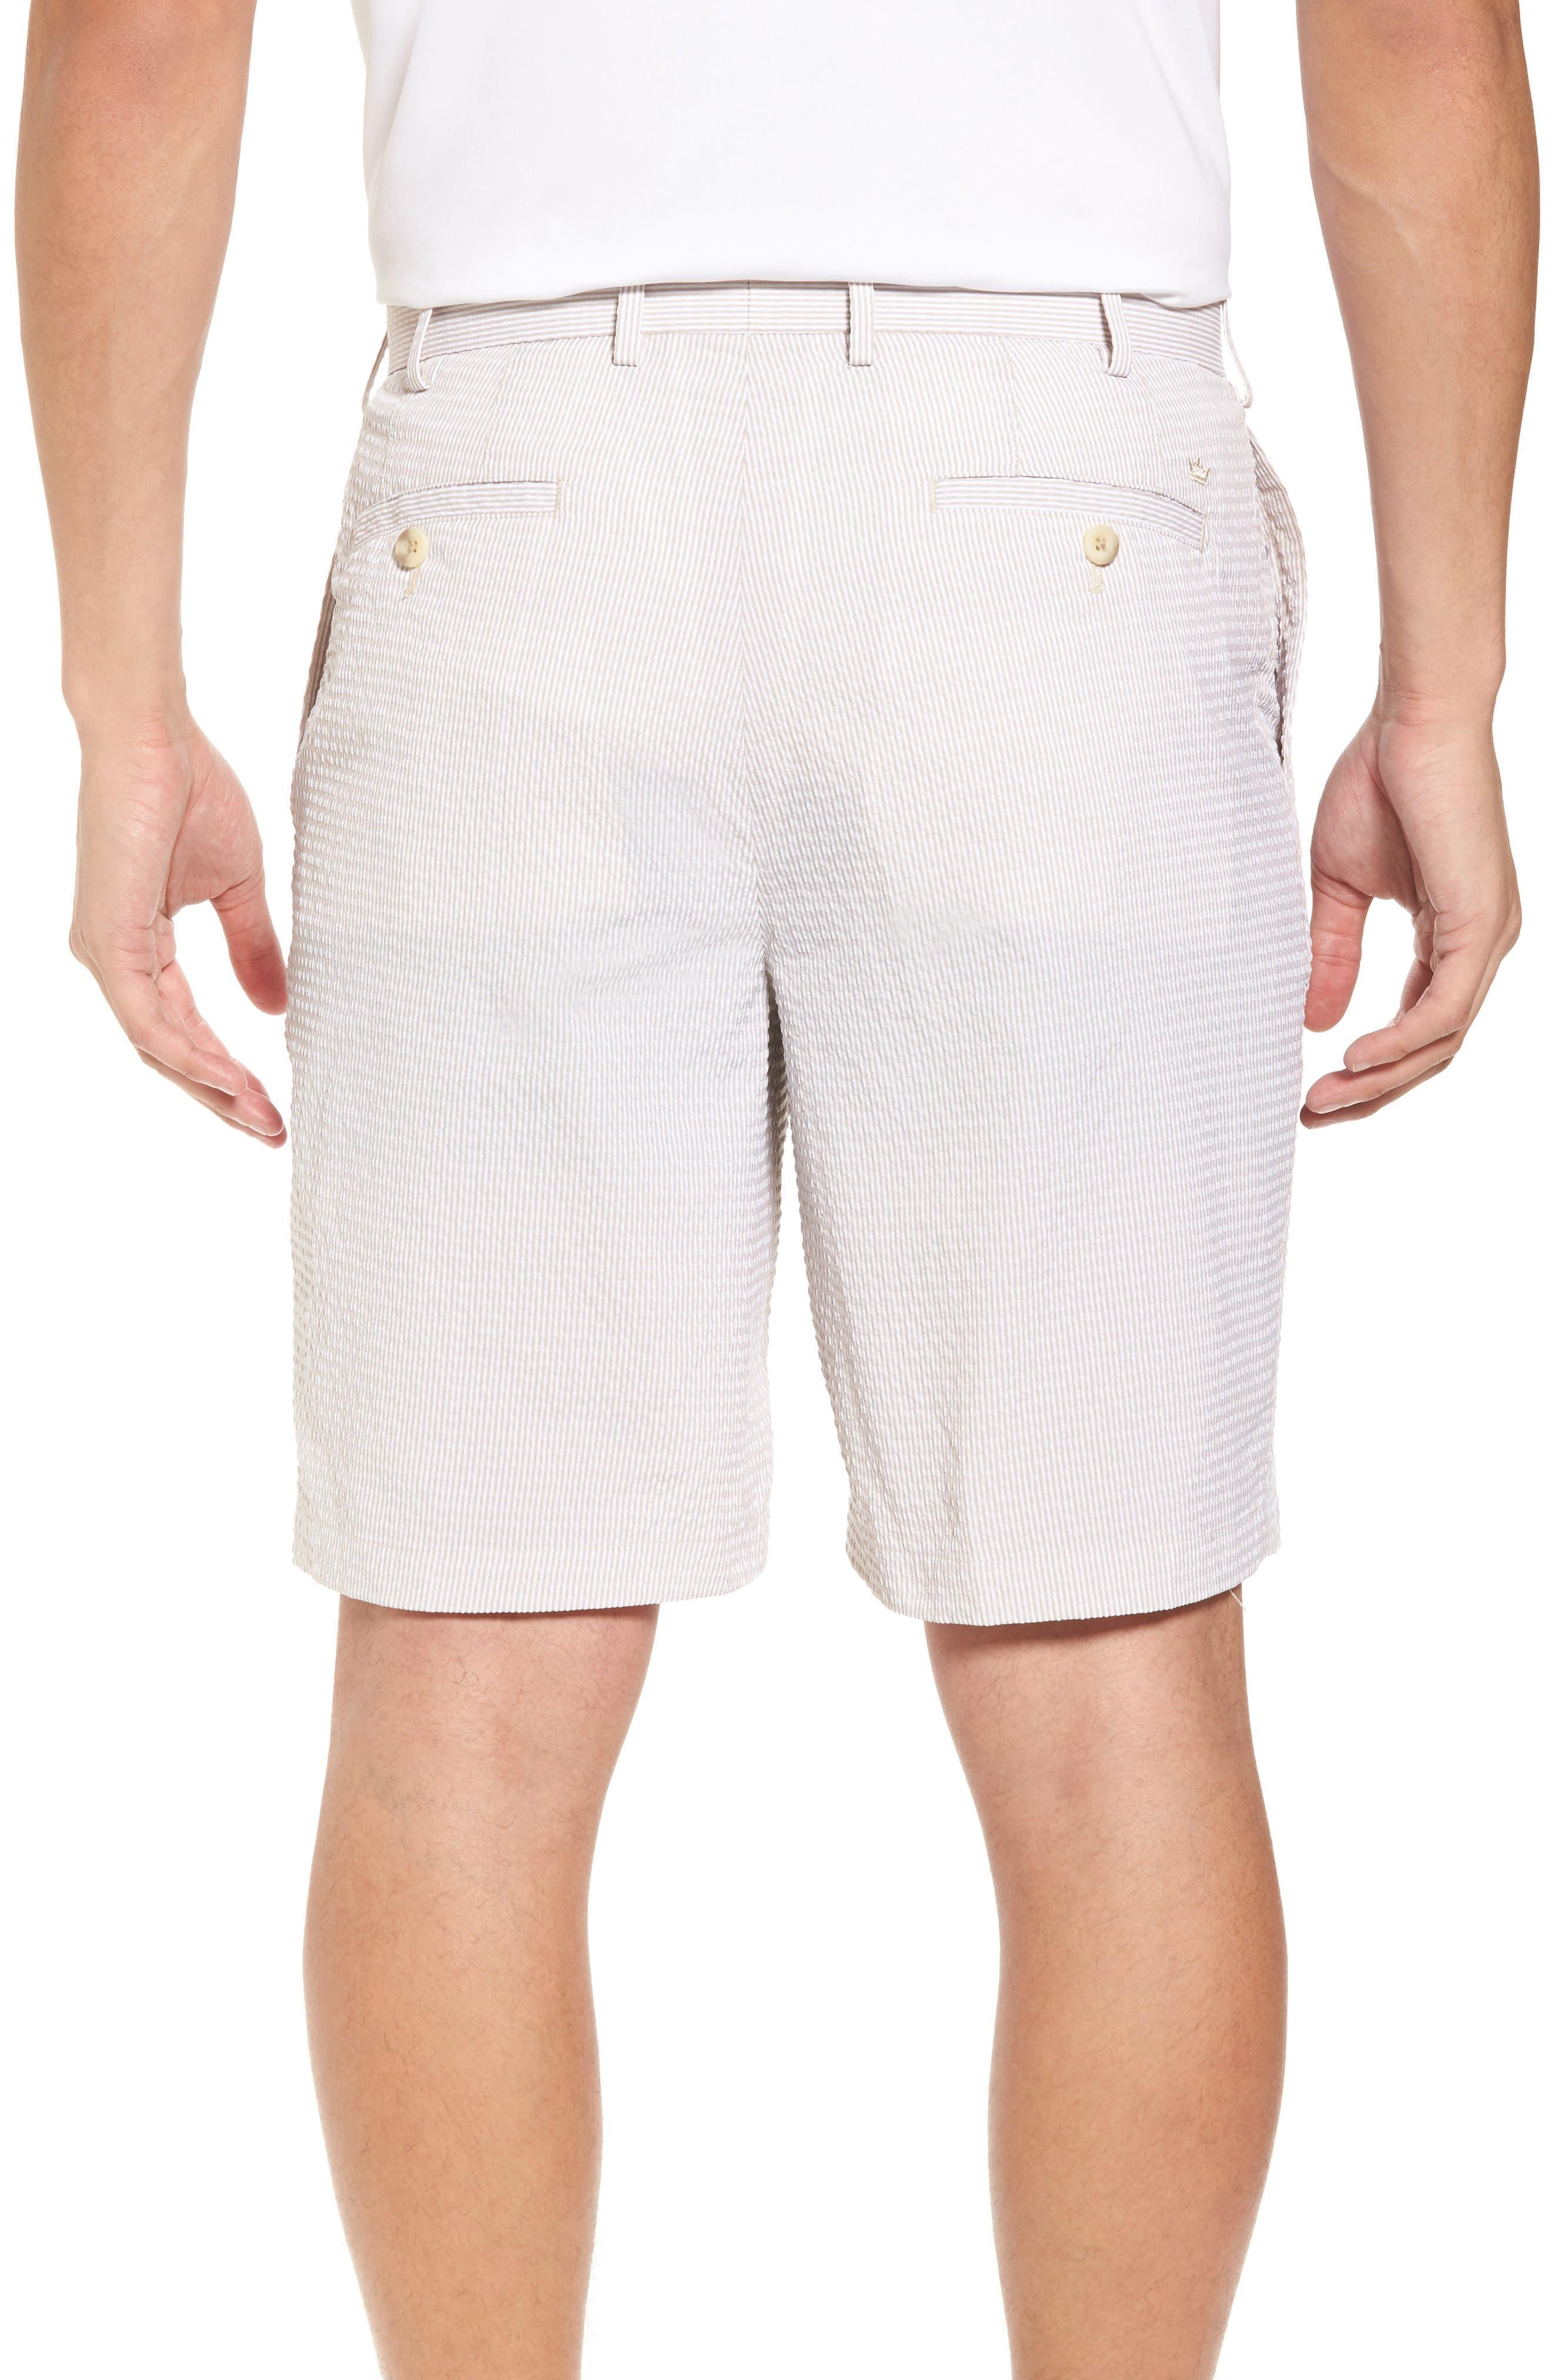 Apex Pinstripe Seersucker Shorts,                             Alternate thumbnail 2, color,                             260